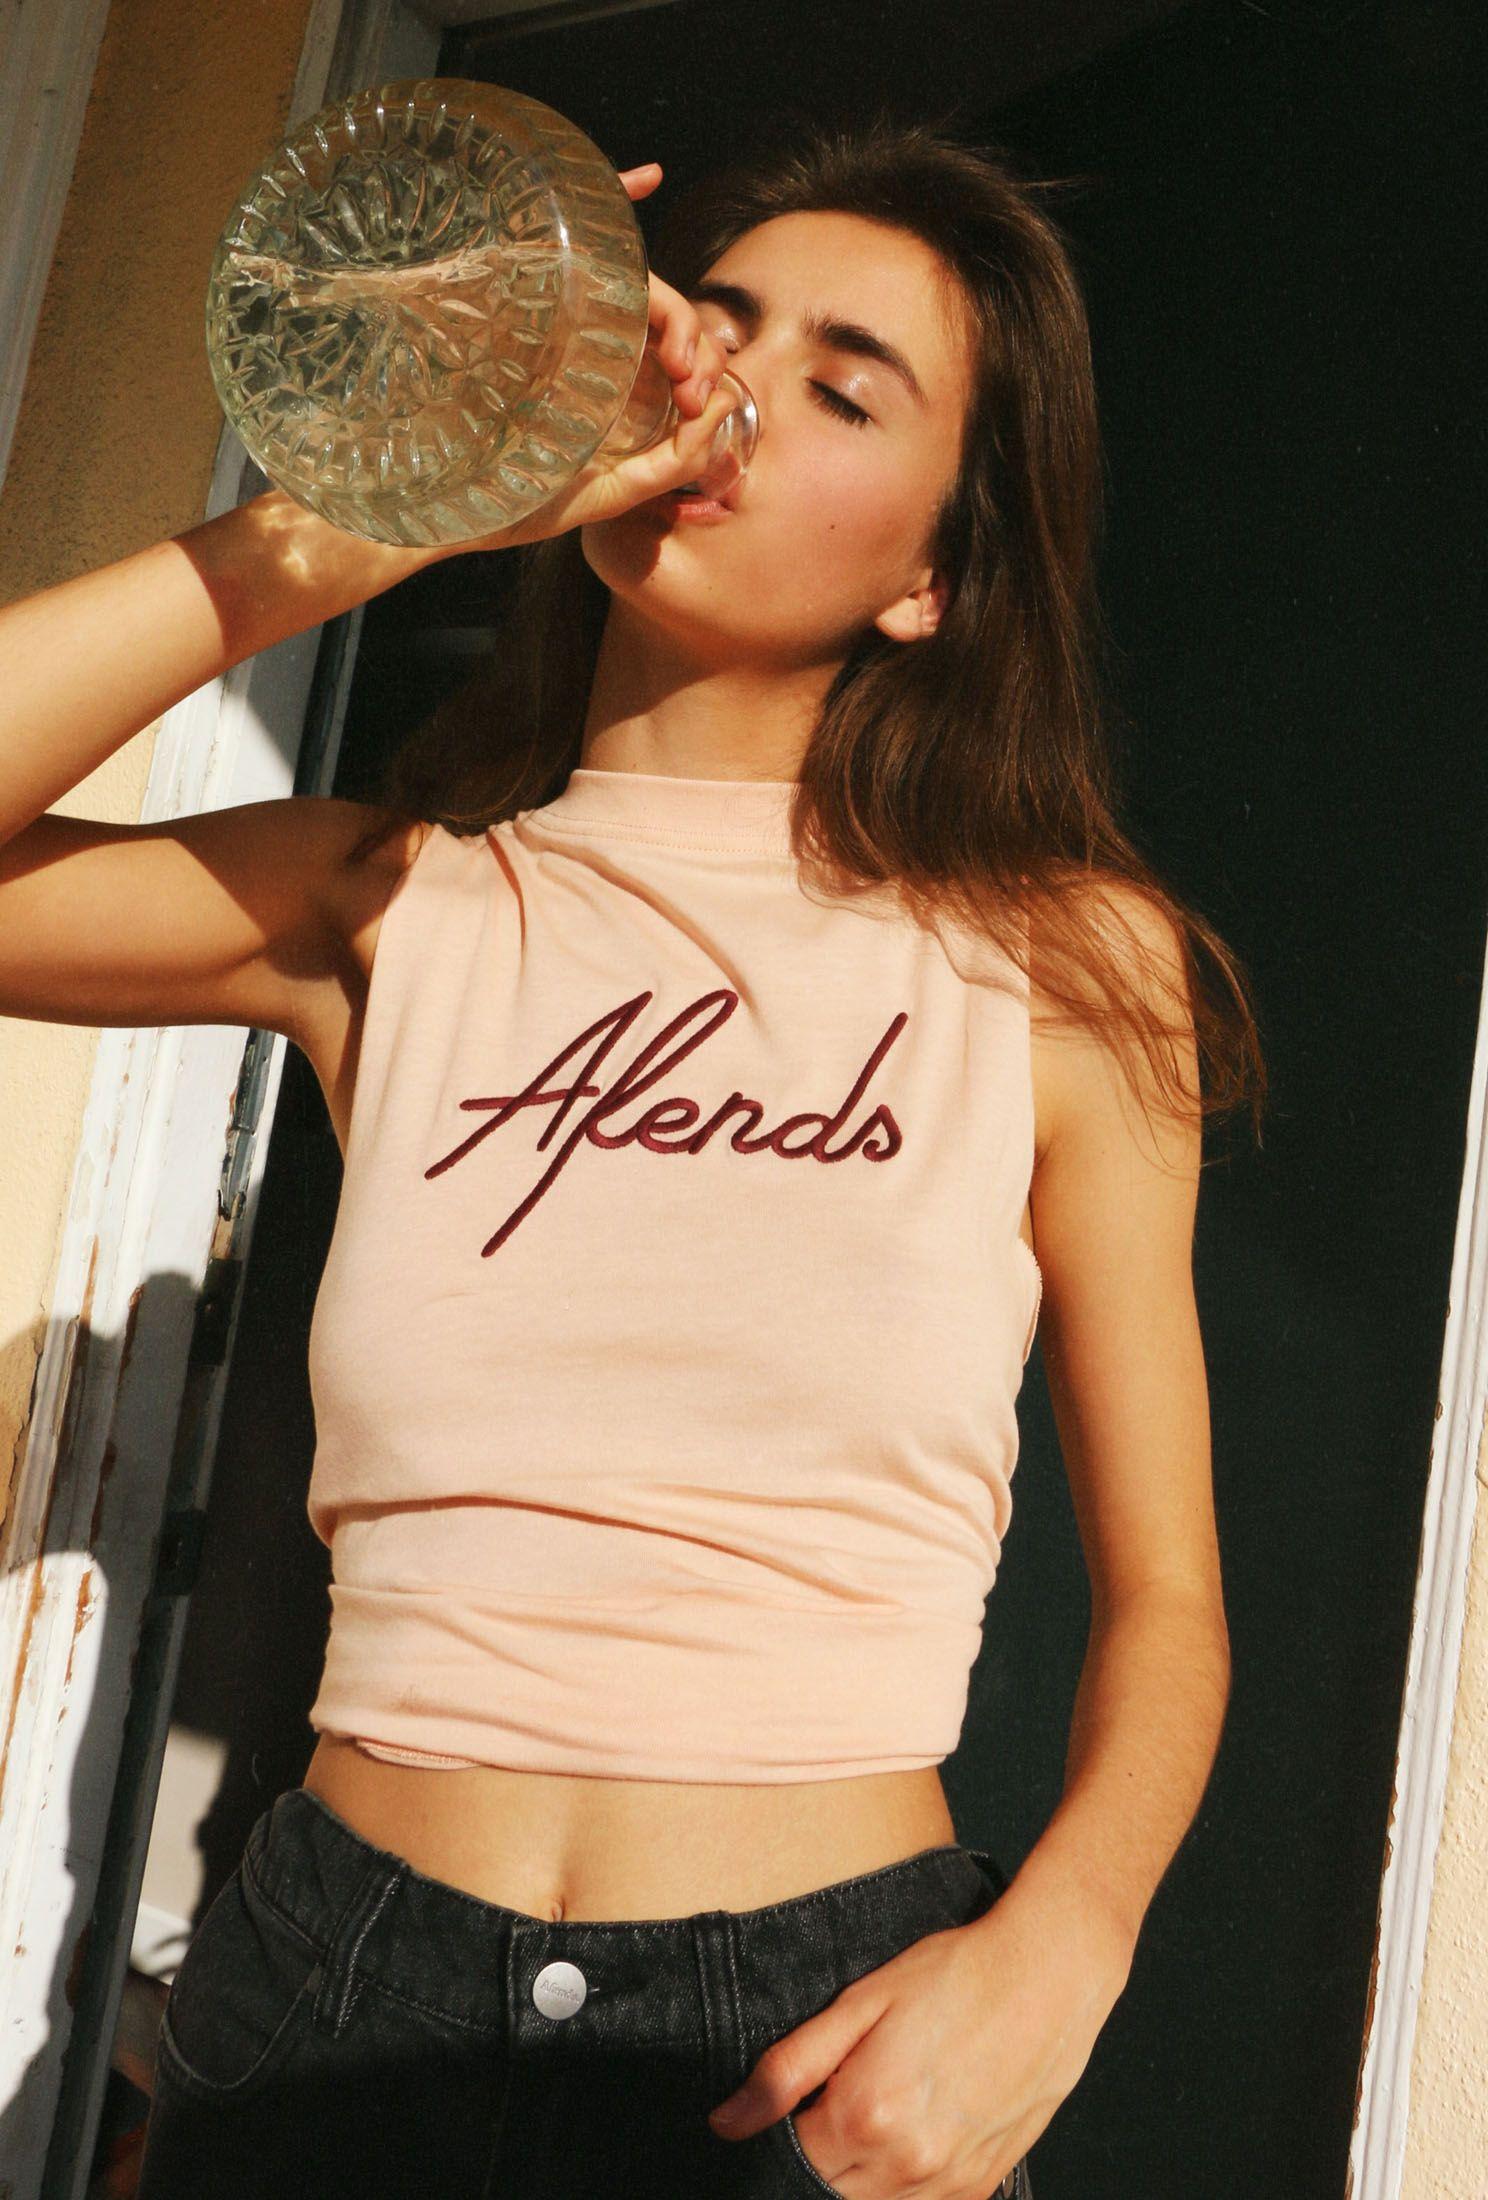 345f190c #afends #virgingoldcult #alexleeaillon #losangeles #byronbay #sweater  #denim #shorts #model #autumn #2018 #photoshoot #crewneck #sweater #stripe  #california ...